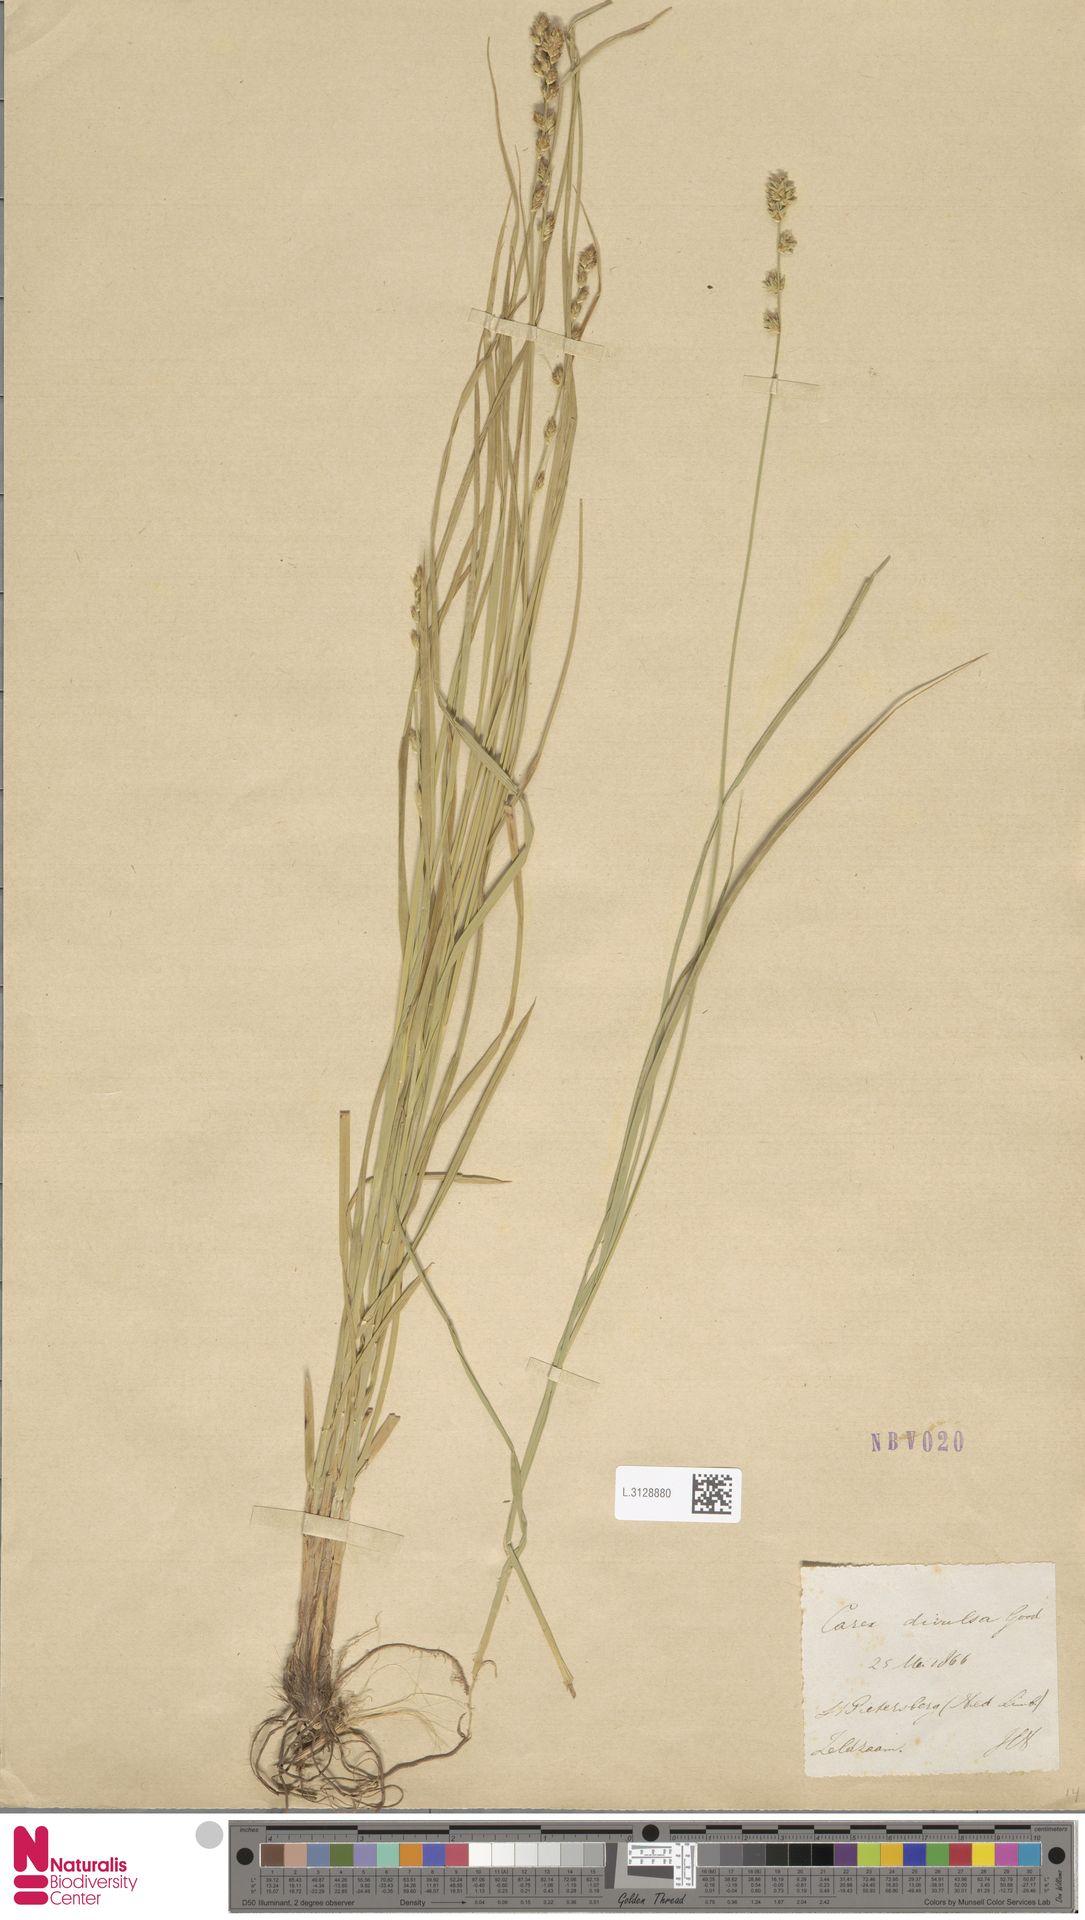 L.3128880   Carex divulsa Stokes